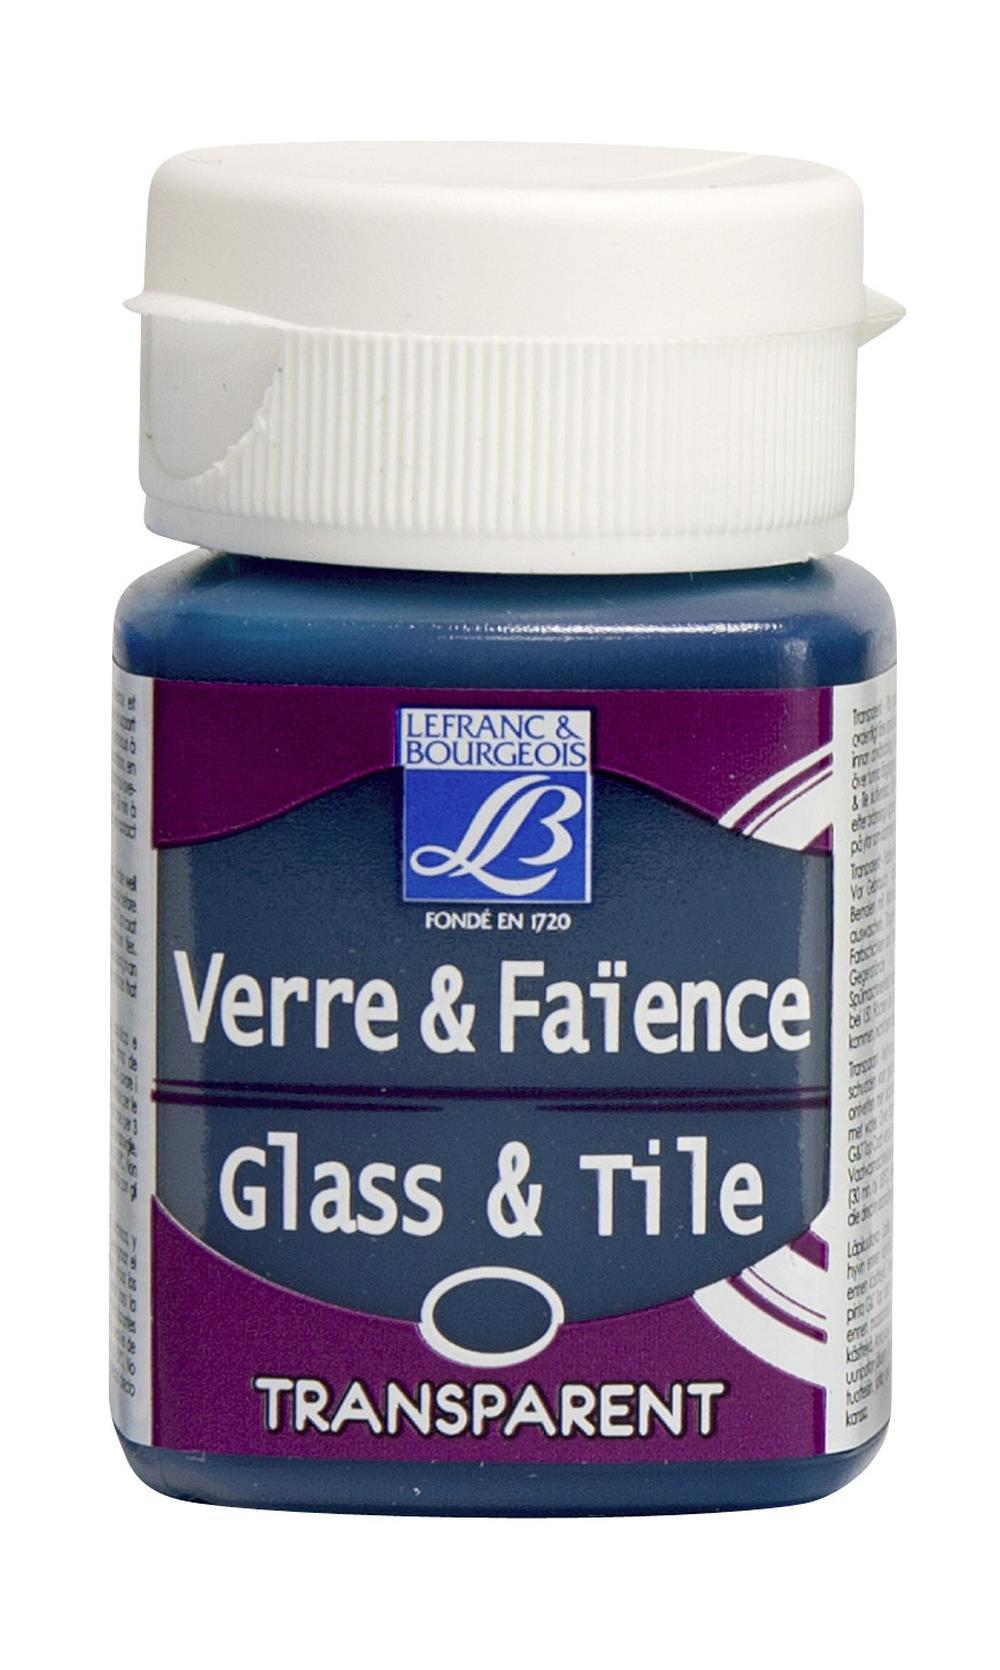 Glas- & keramikfärg L&B 50ml  Turkosblå, transparent  058 (4F) Utgår